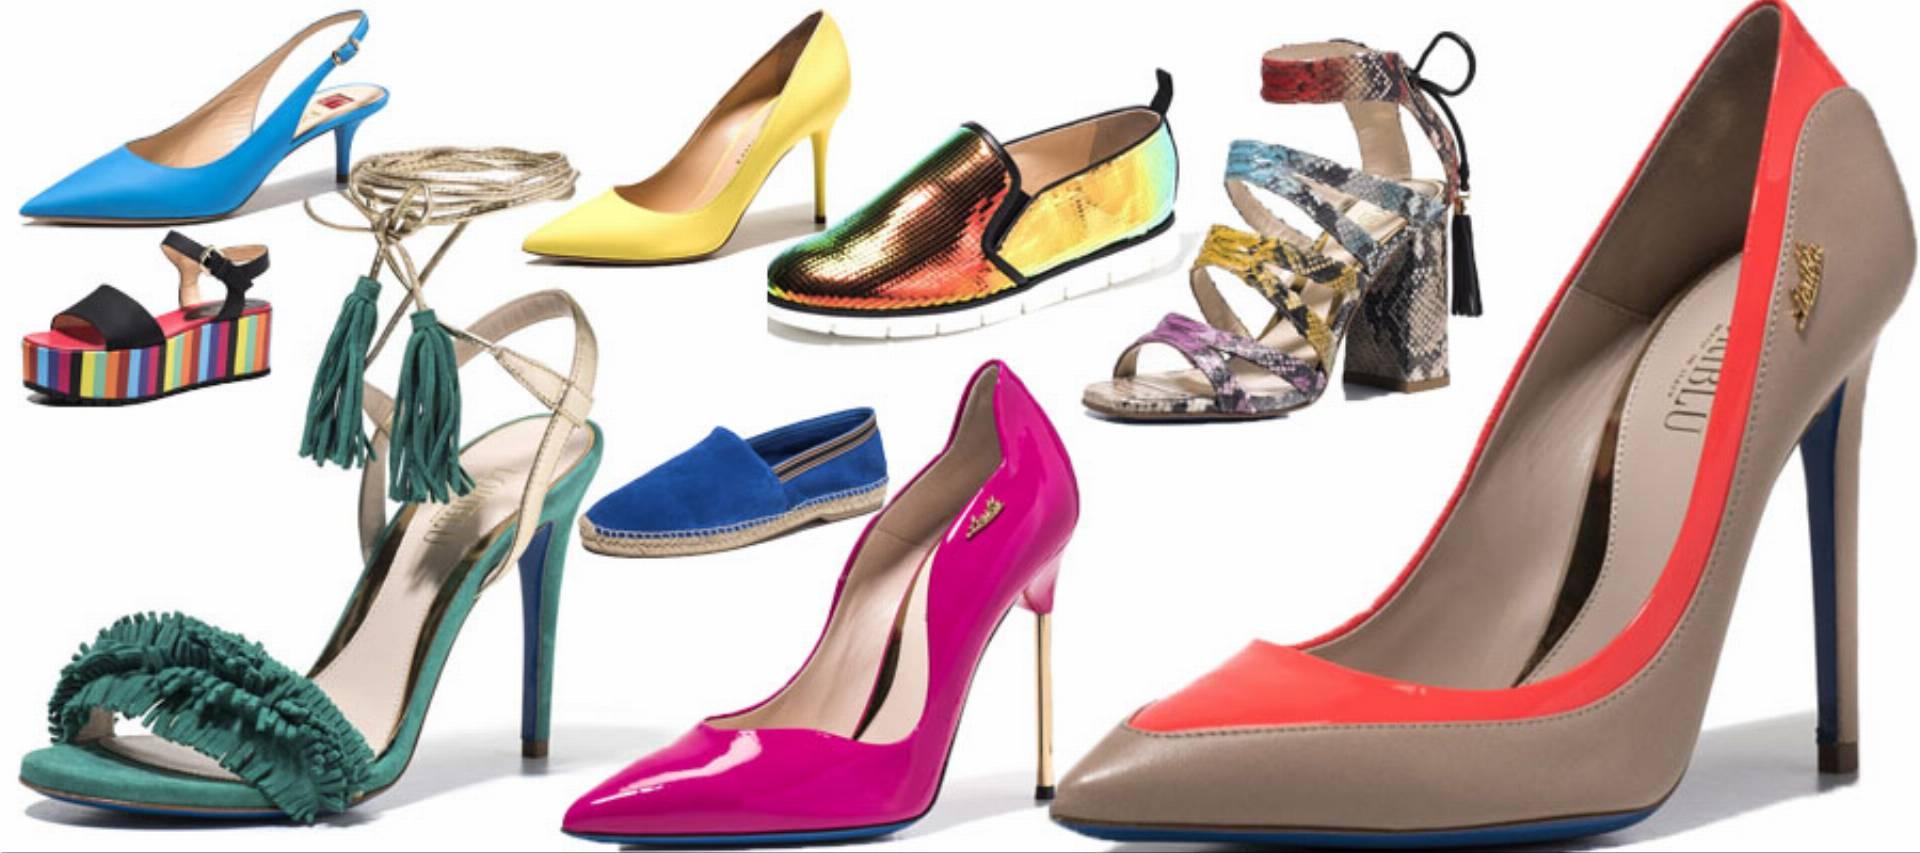 kolorowe buty na lato 2016